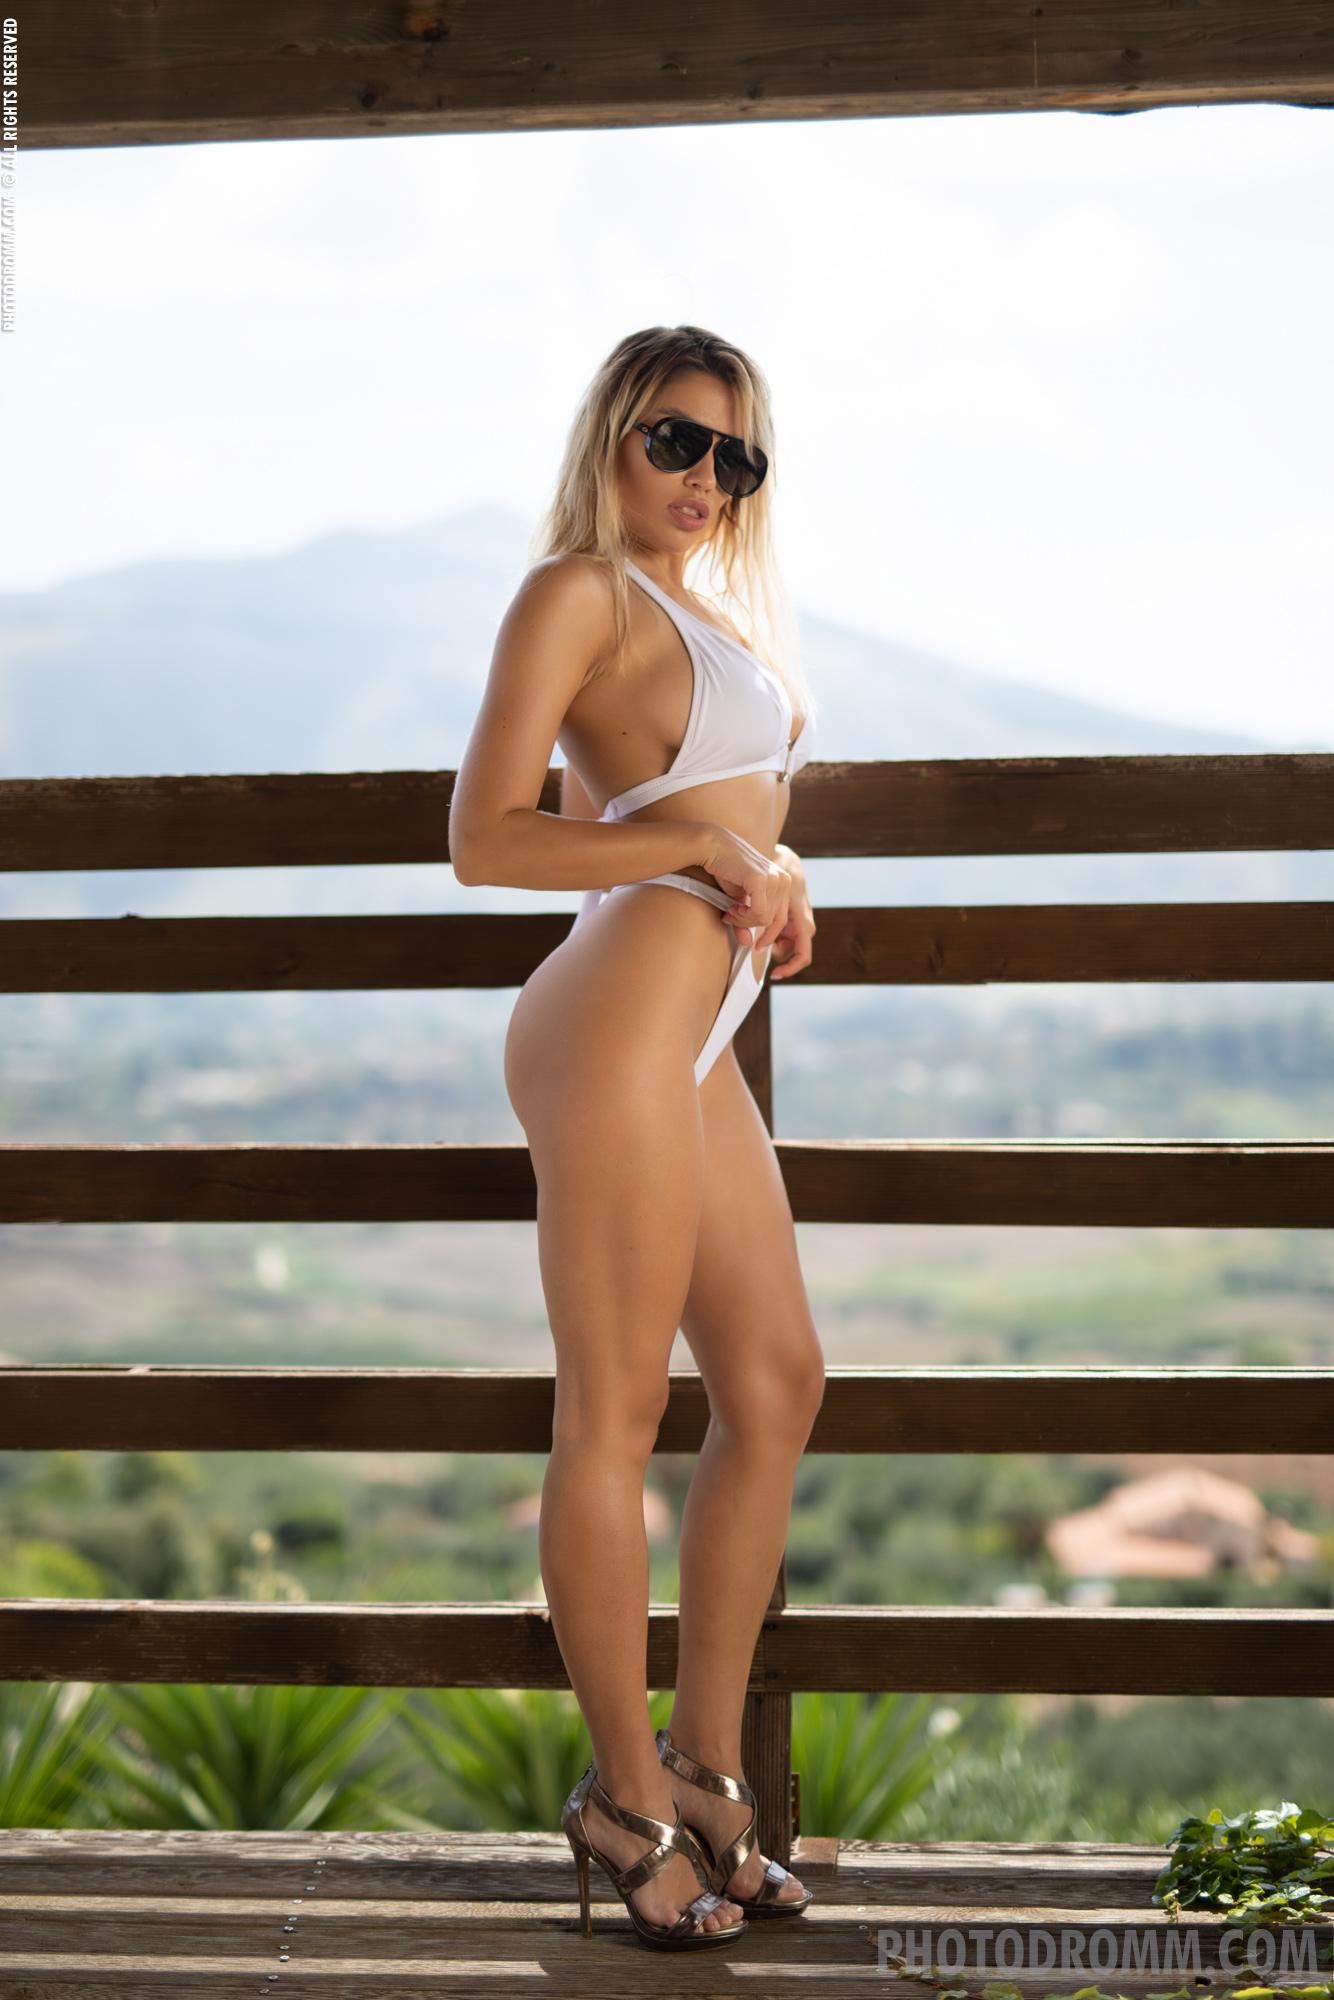 Margot Big Tit Blonde in White Bikini for Photodromm